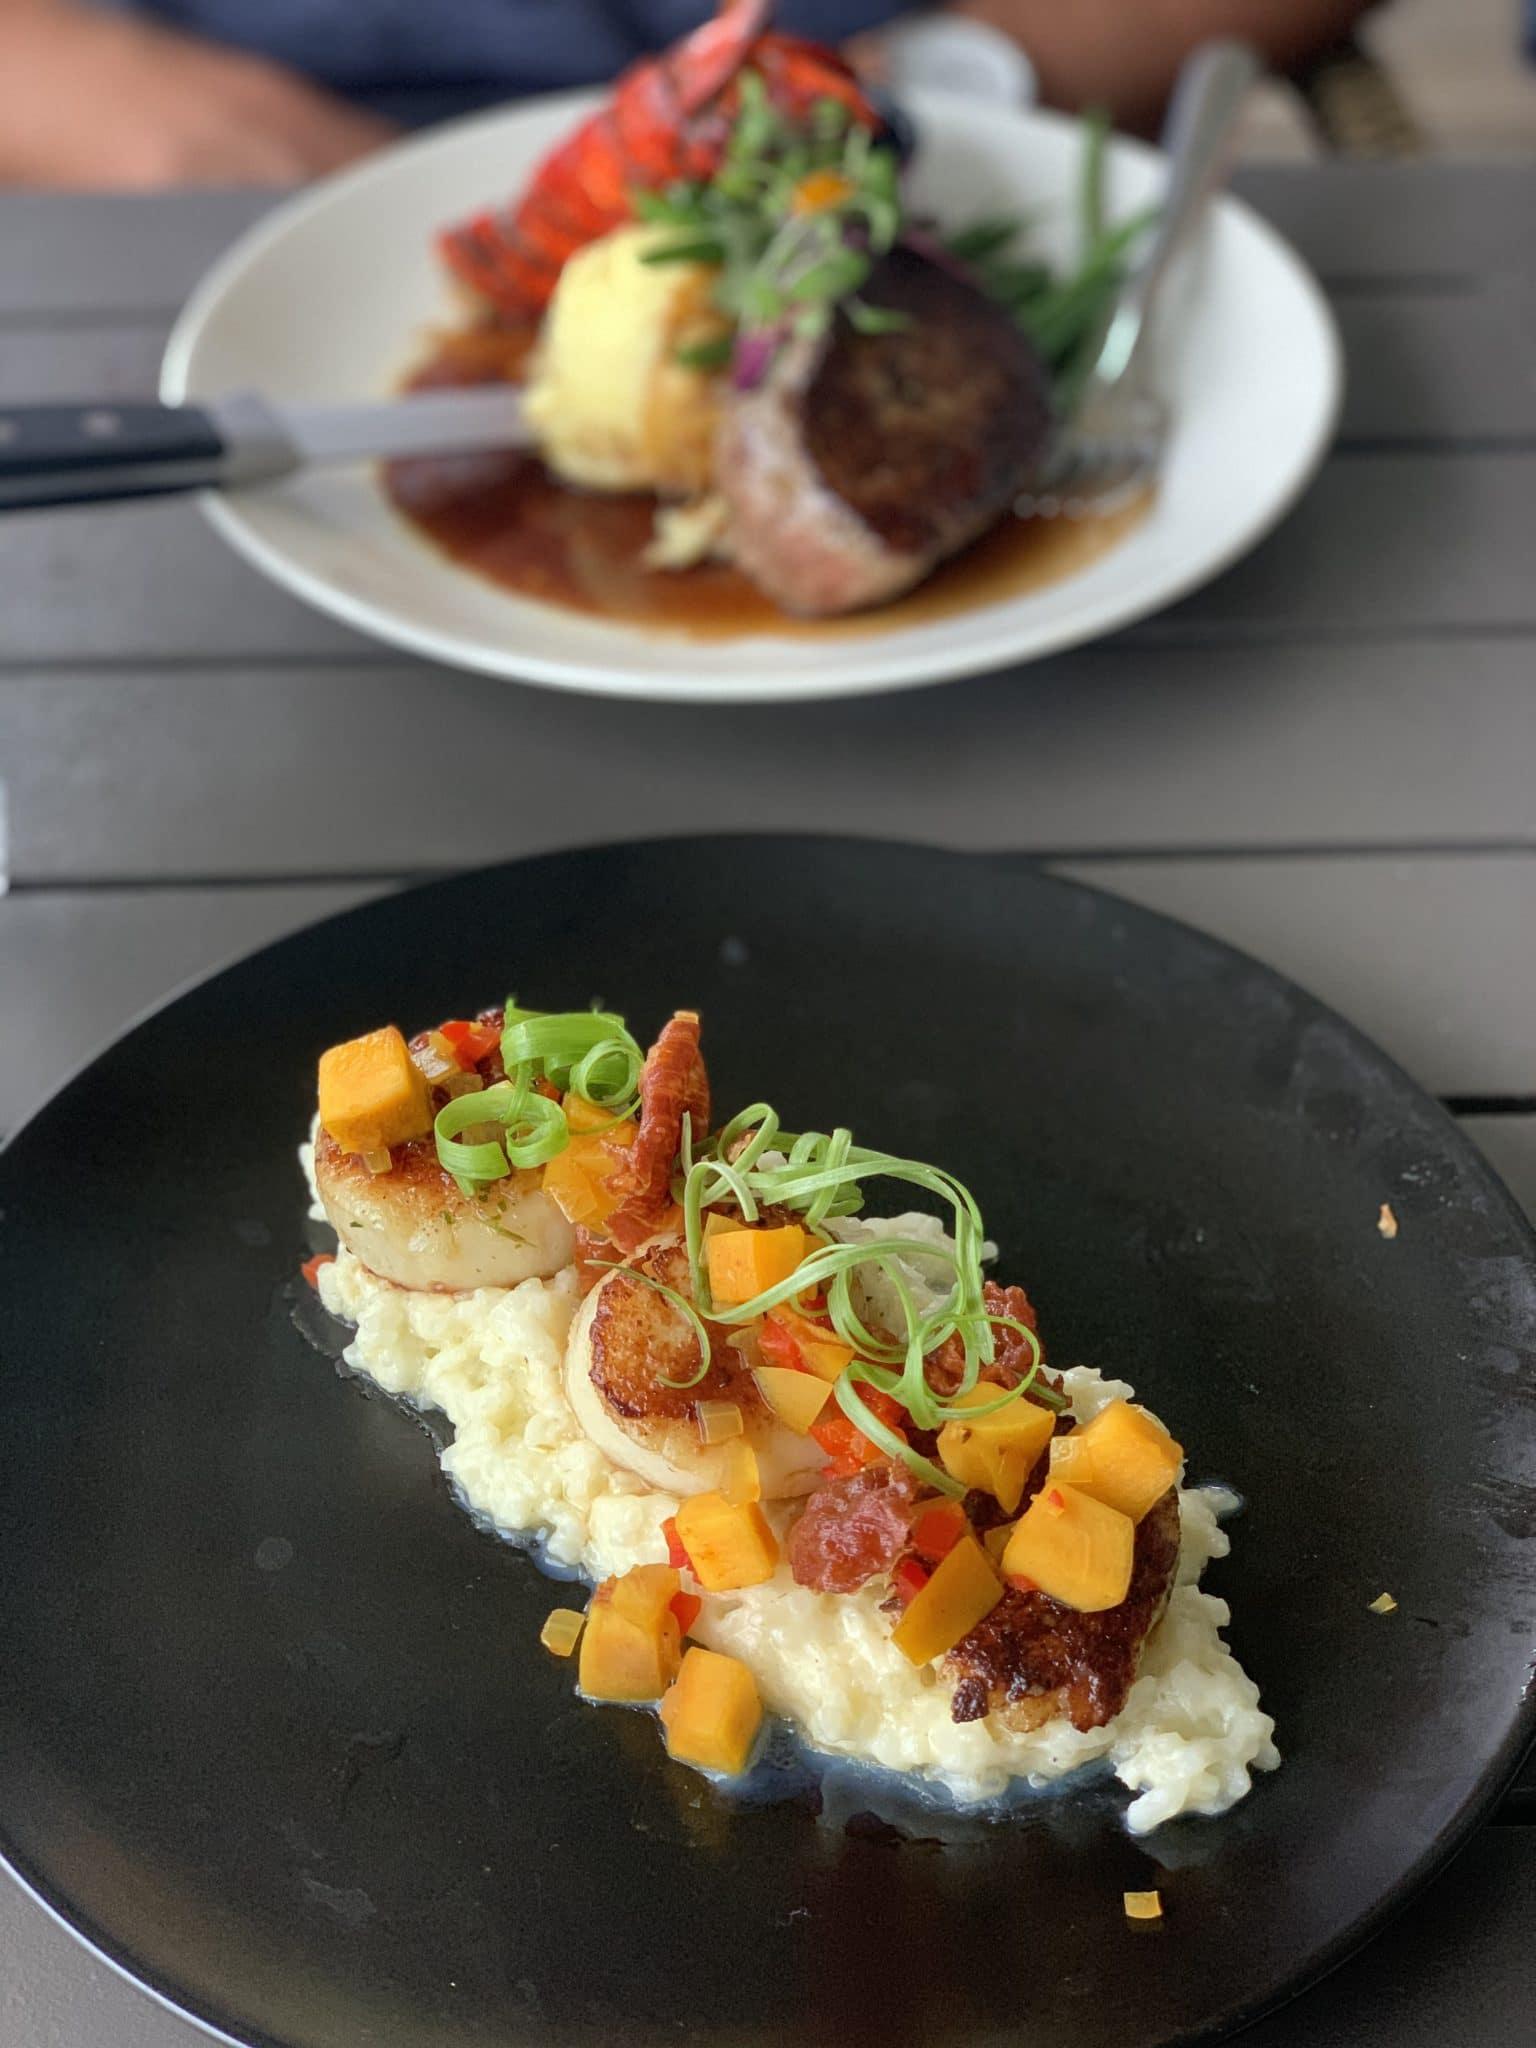 Coast Hilton Head Island Review, Best restaurants in Hilton Head, Stilettos and Diapers